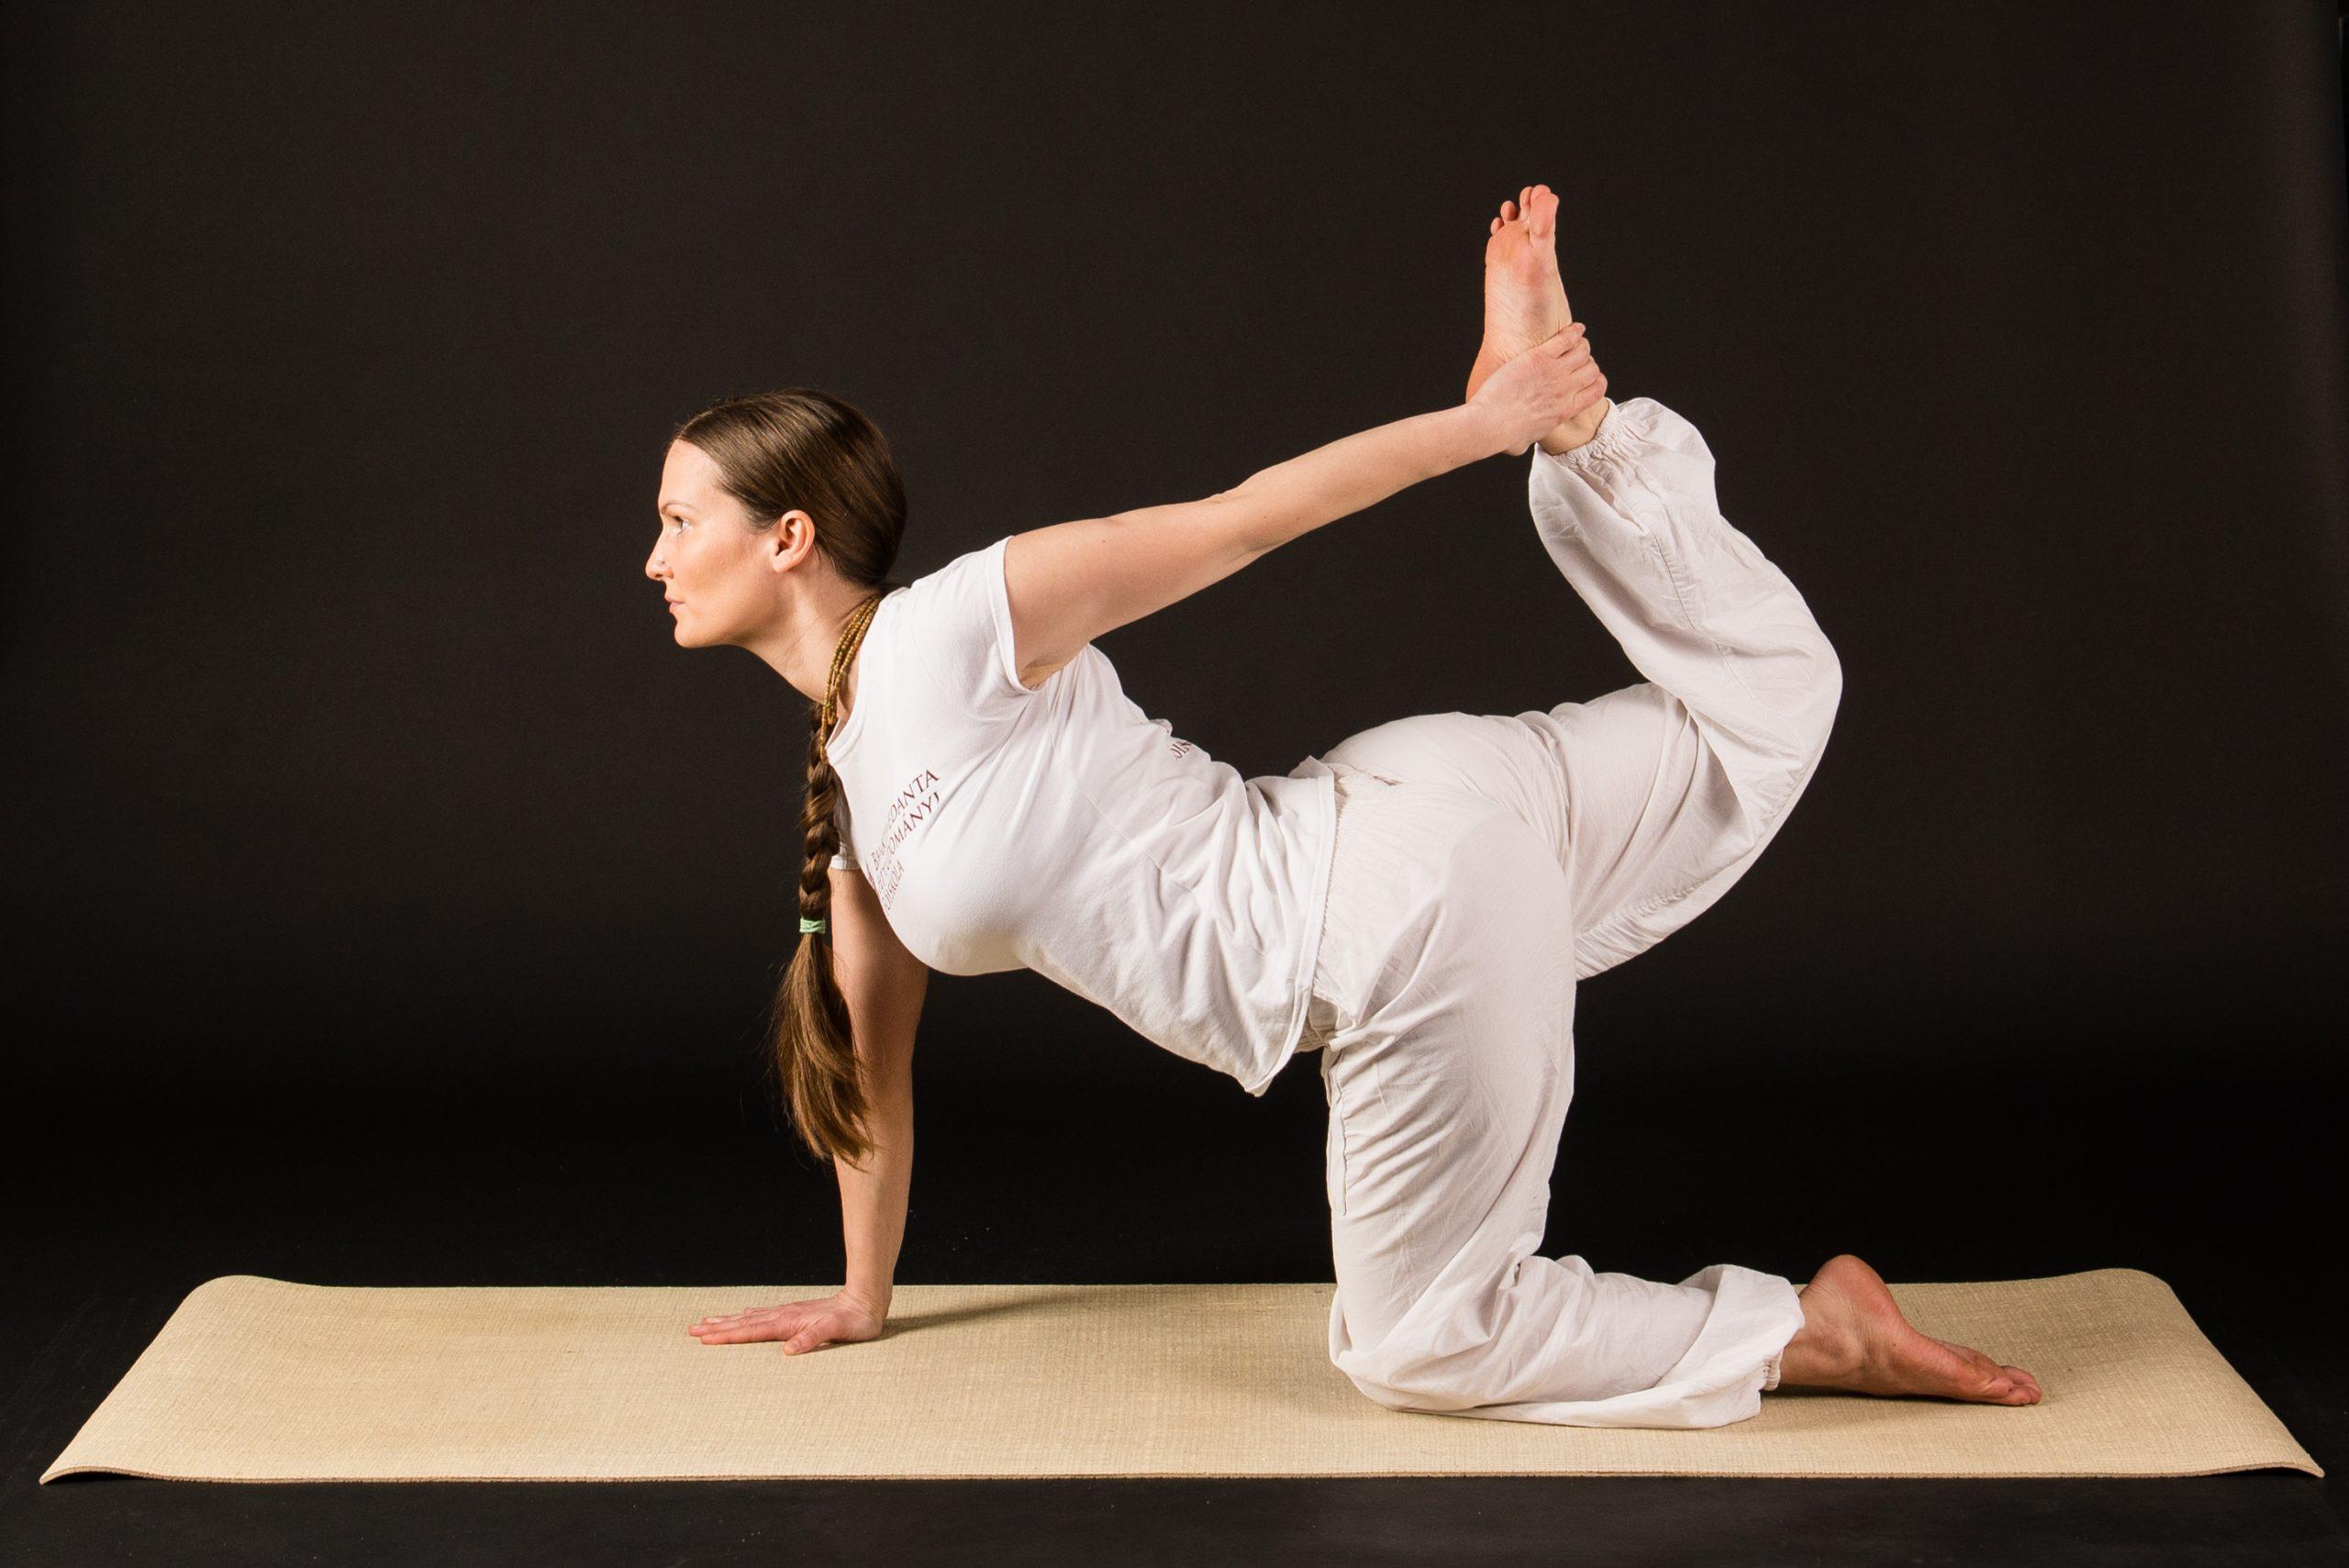 a magas vérnyomás súlyos konfliktusa magas vérnyomás 1 fokos gyakorlat